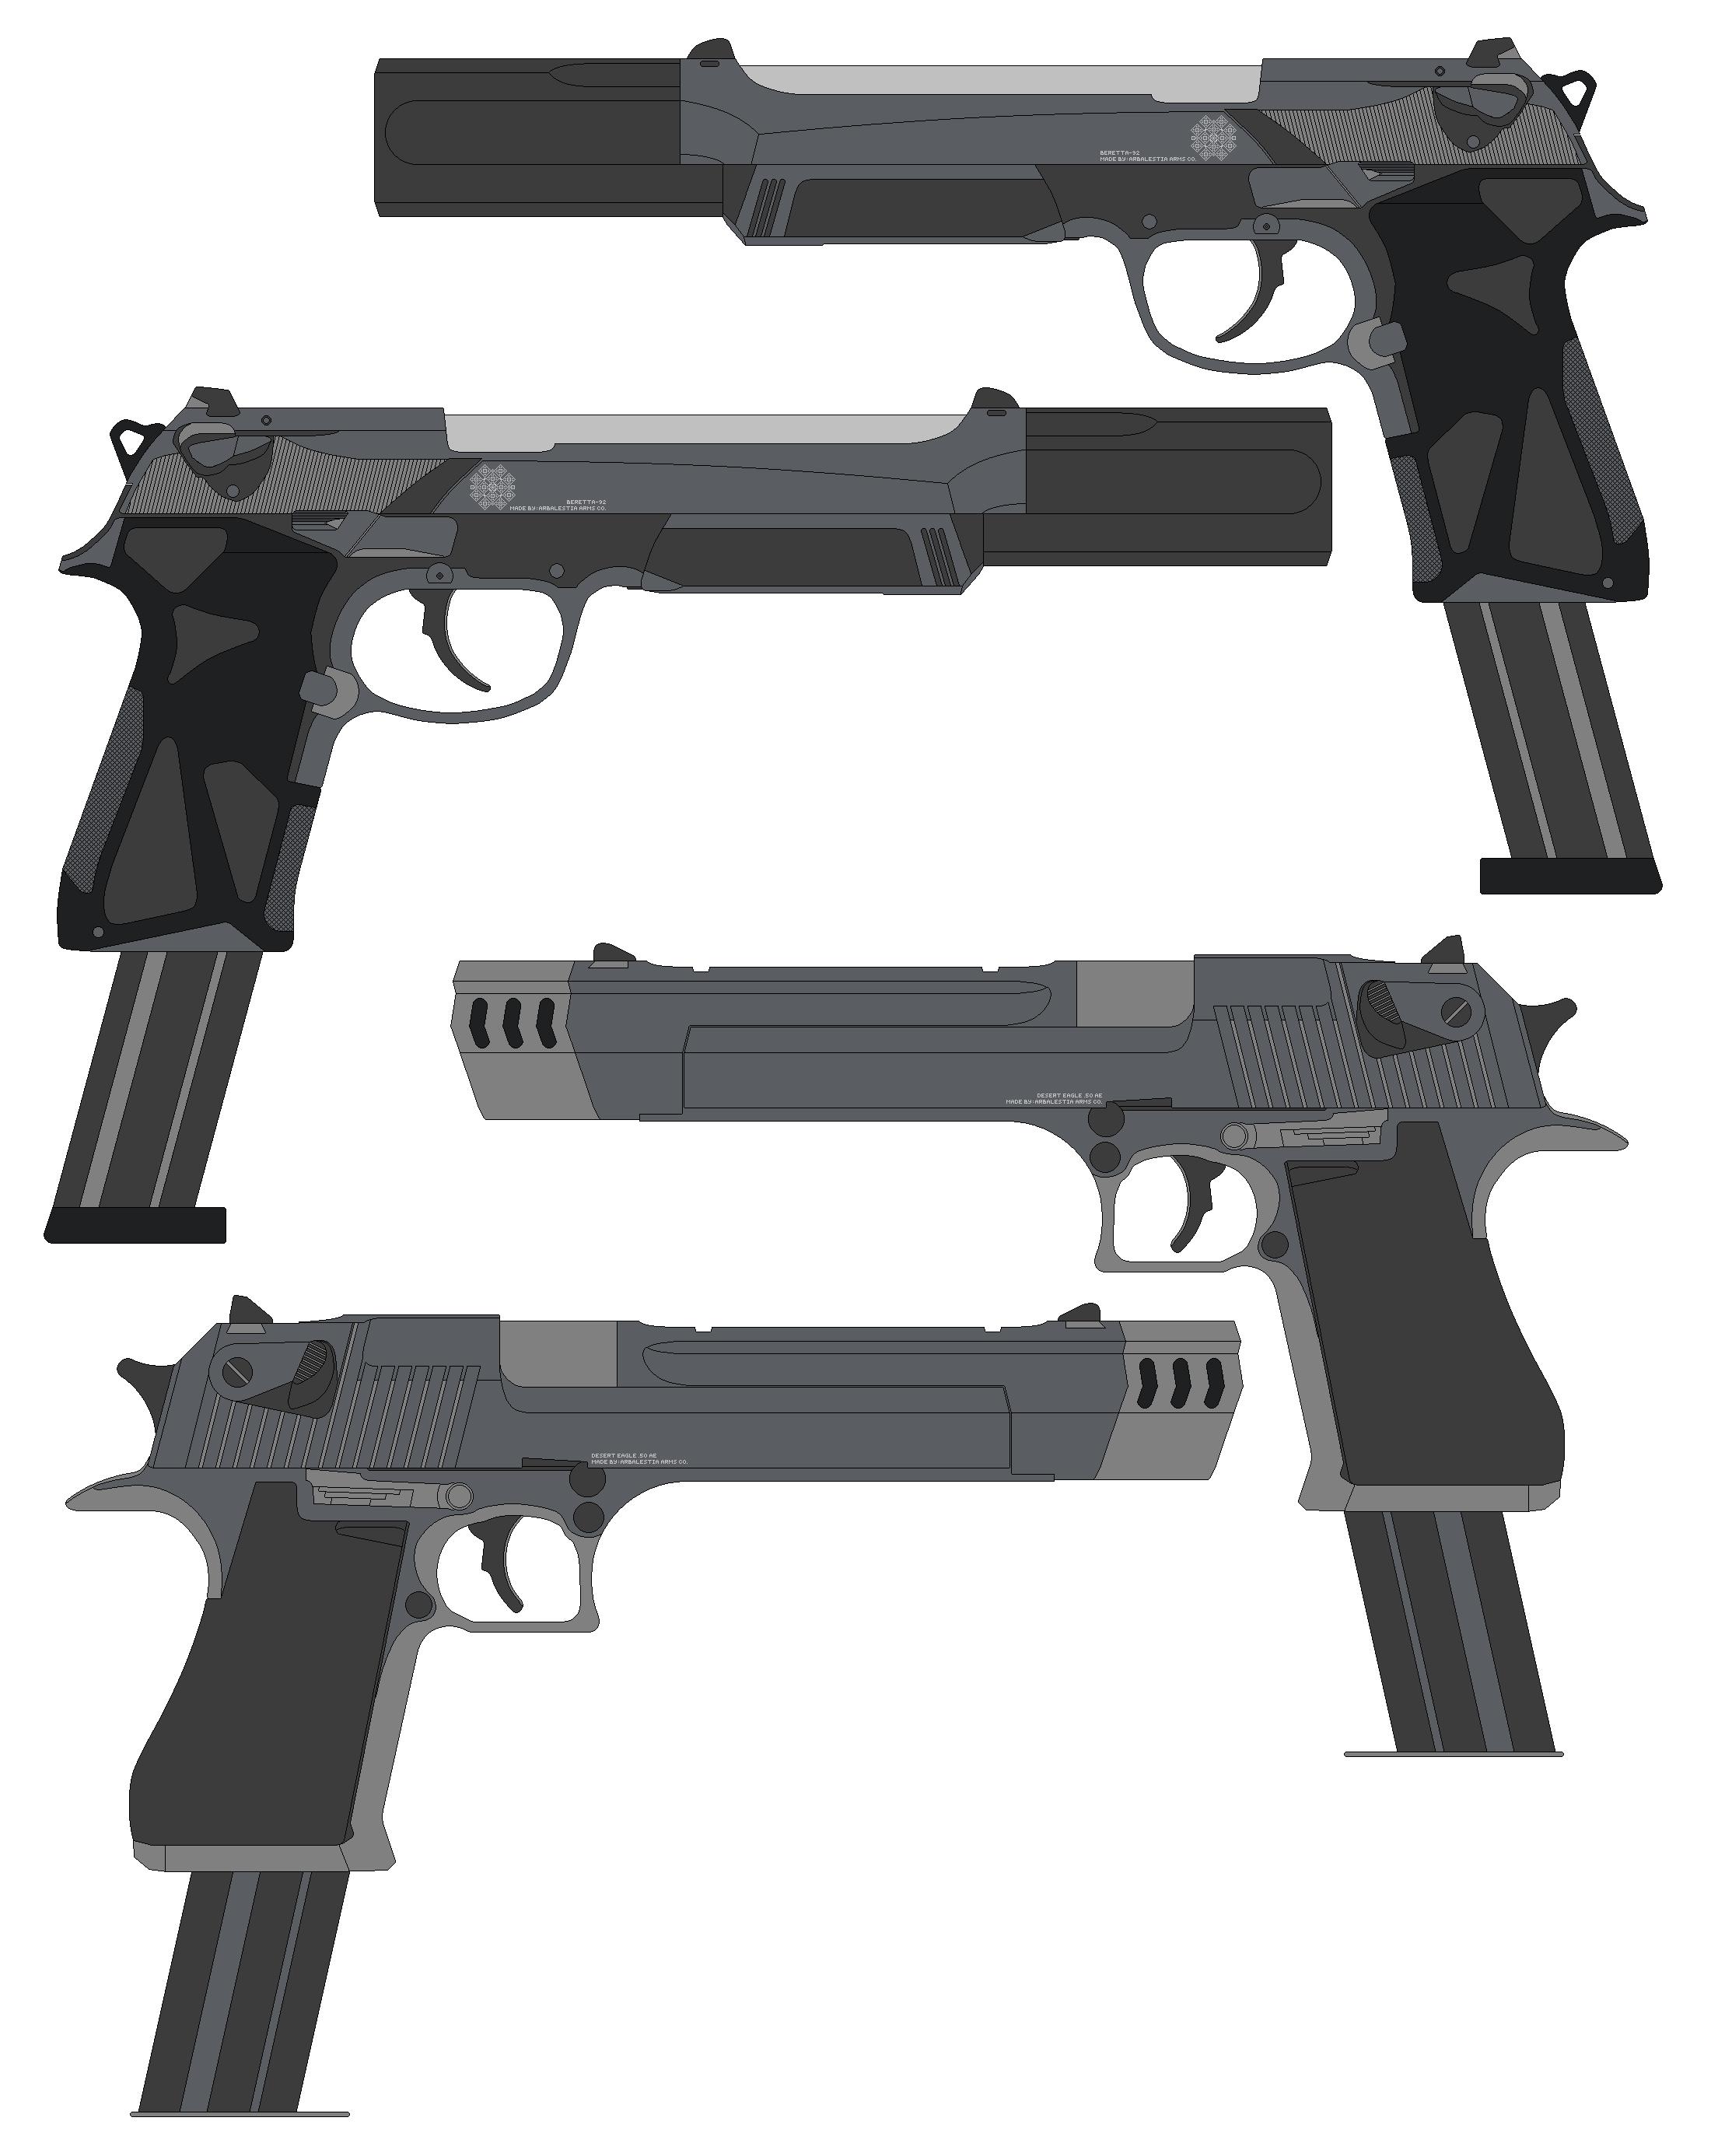 DE's and Berettas for Tofu93 and Koorimizu-K by RenegadeTH on ...